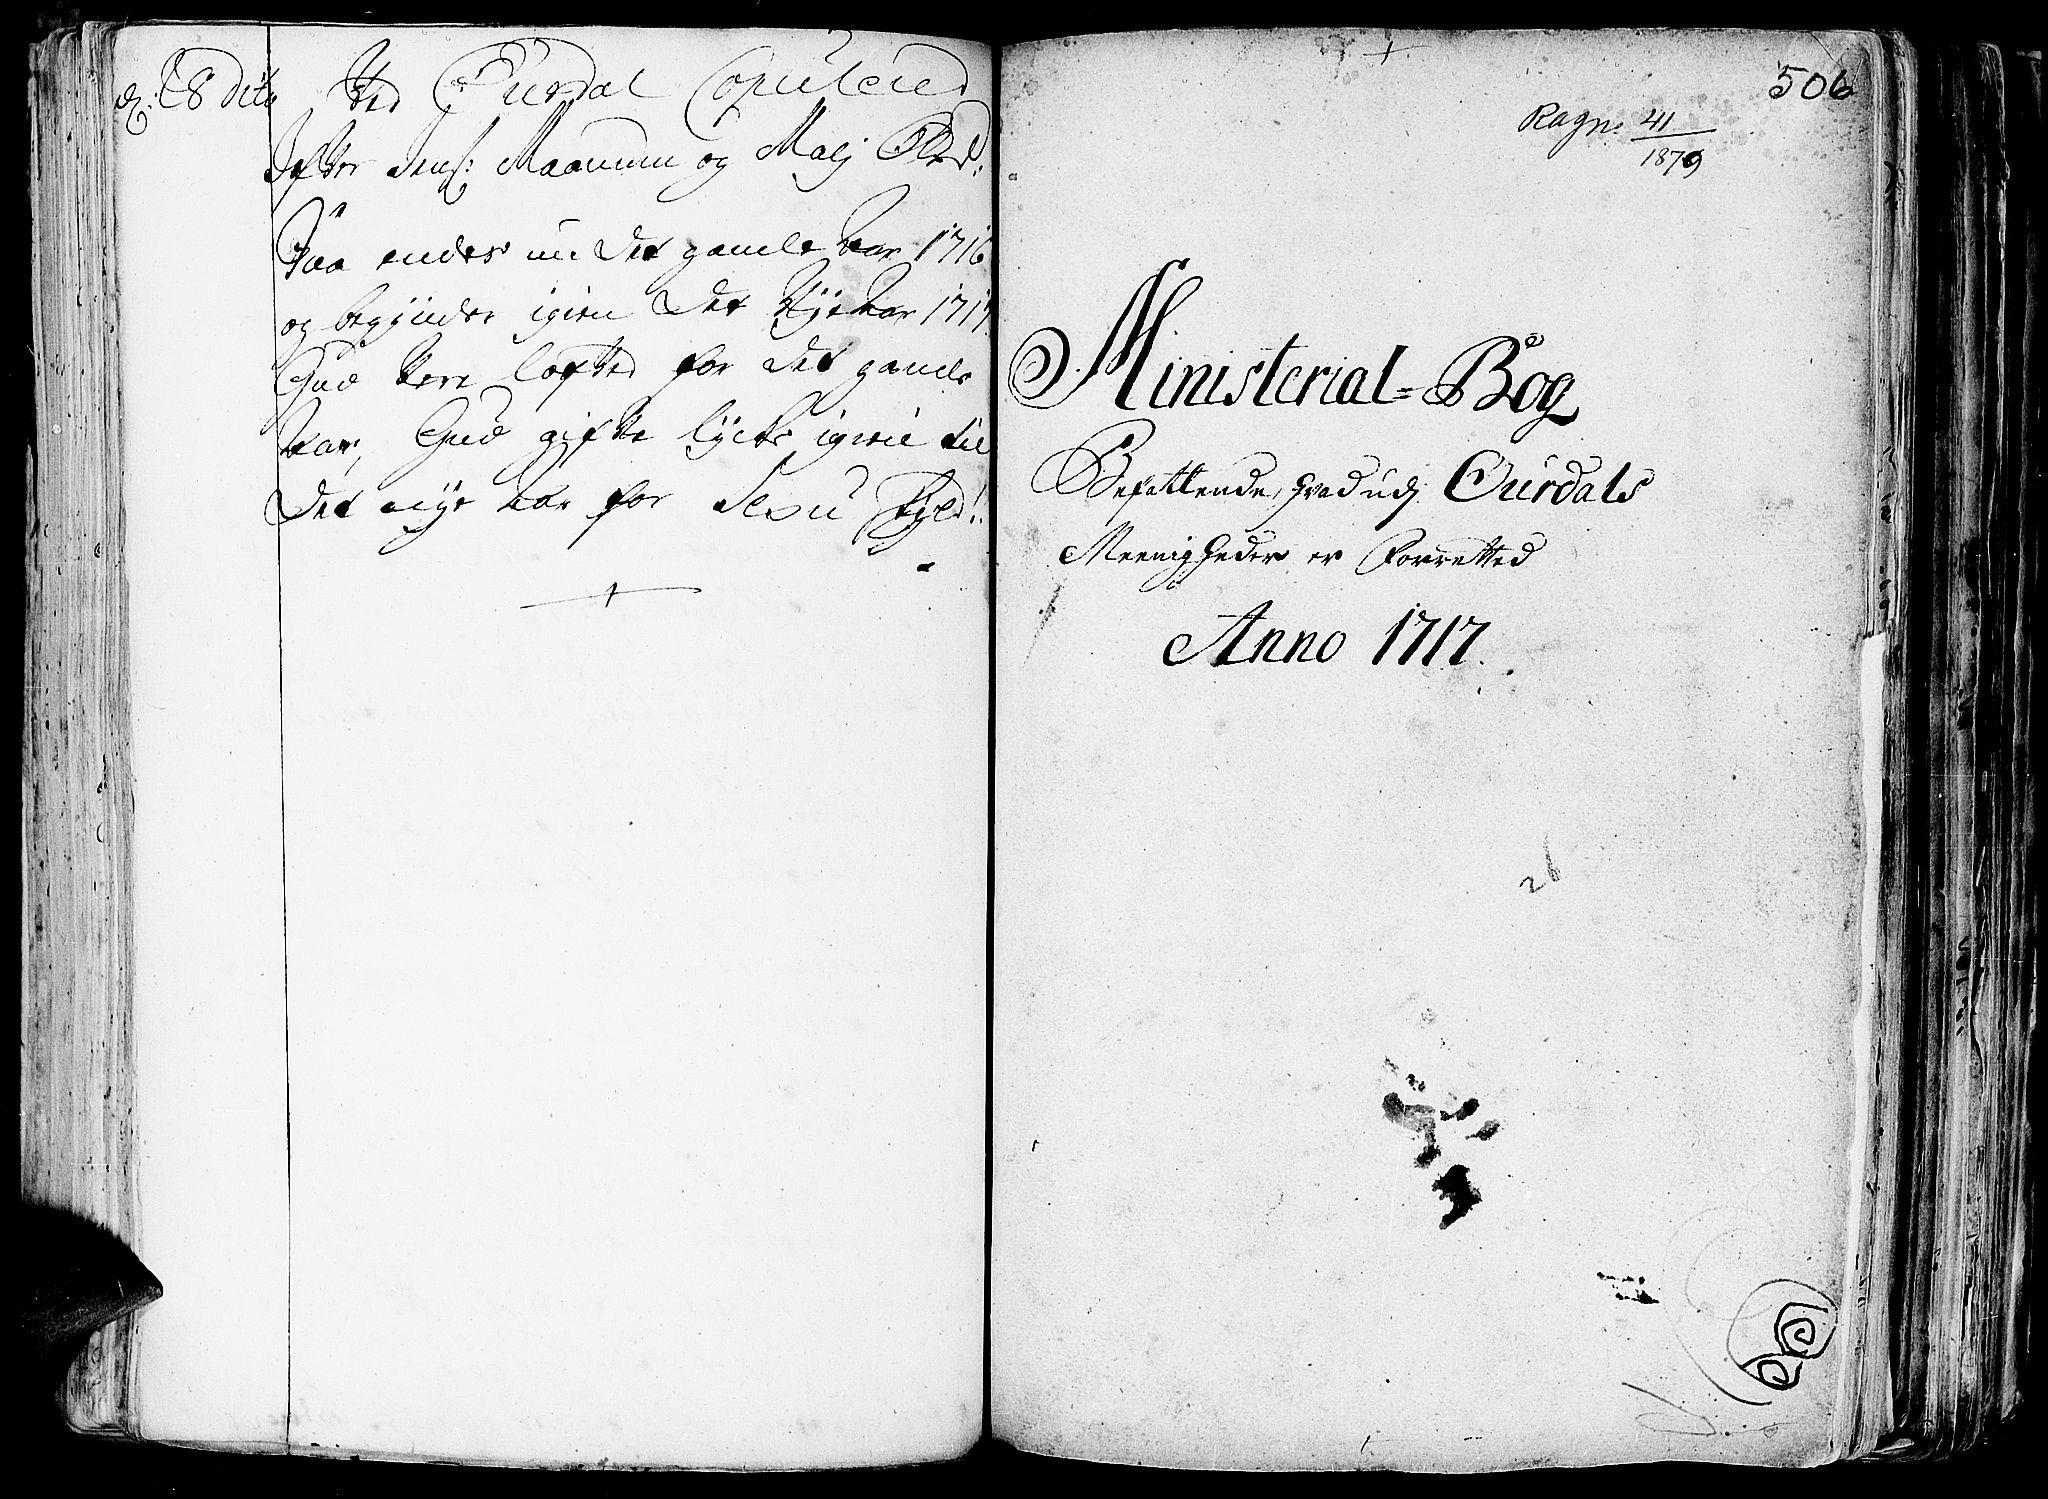 SAH, Aurdal prestekontor, Ministerialbok nr. 1-3, 1692-1730, s. 506